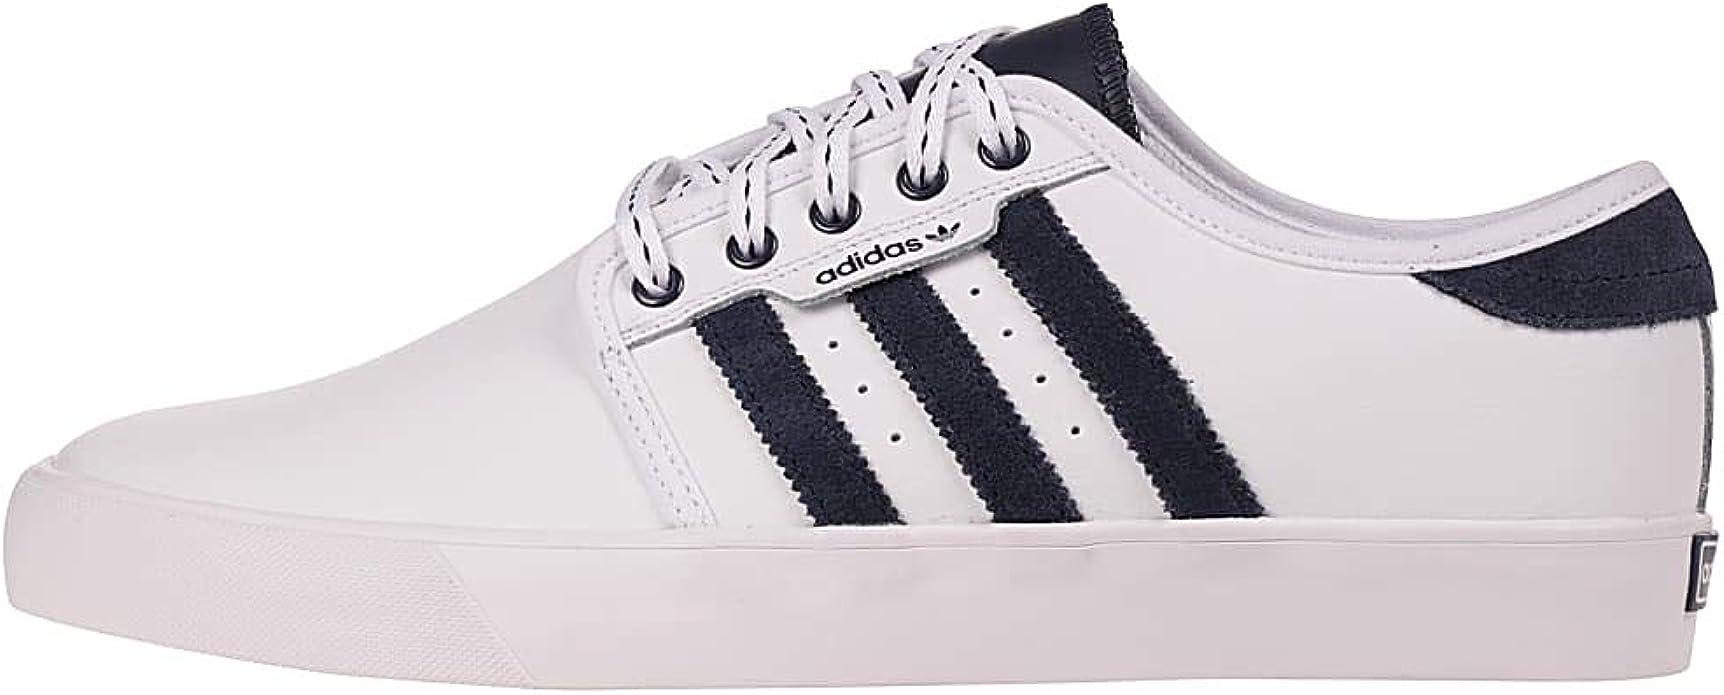 adidas Men's Low-Top Sneakers Skateboarding Shoes